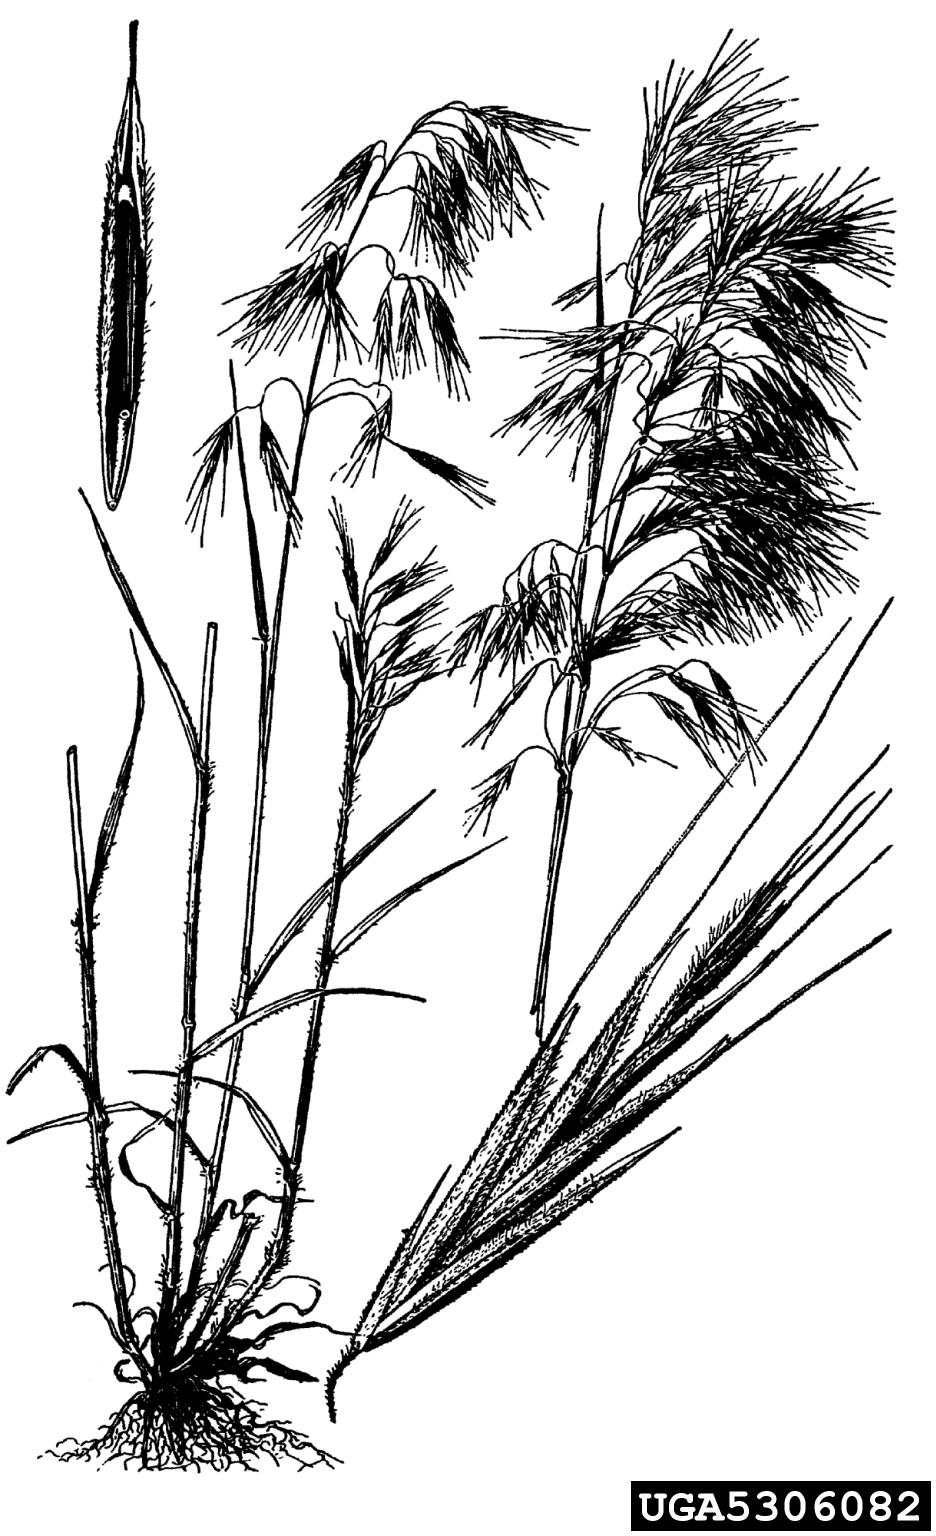 cheatgrass: Bromus tectorum (Cyperales: Poaceae)